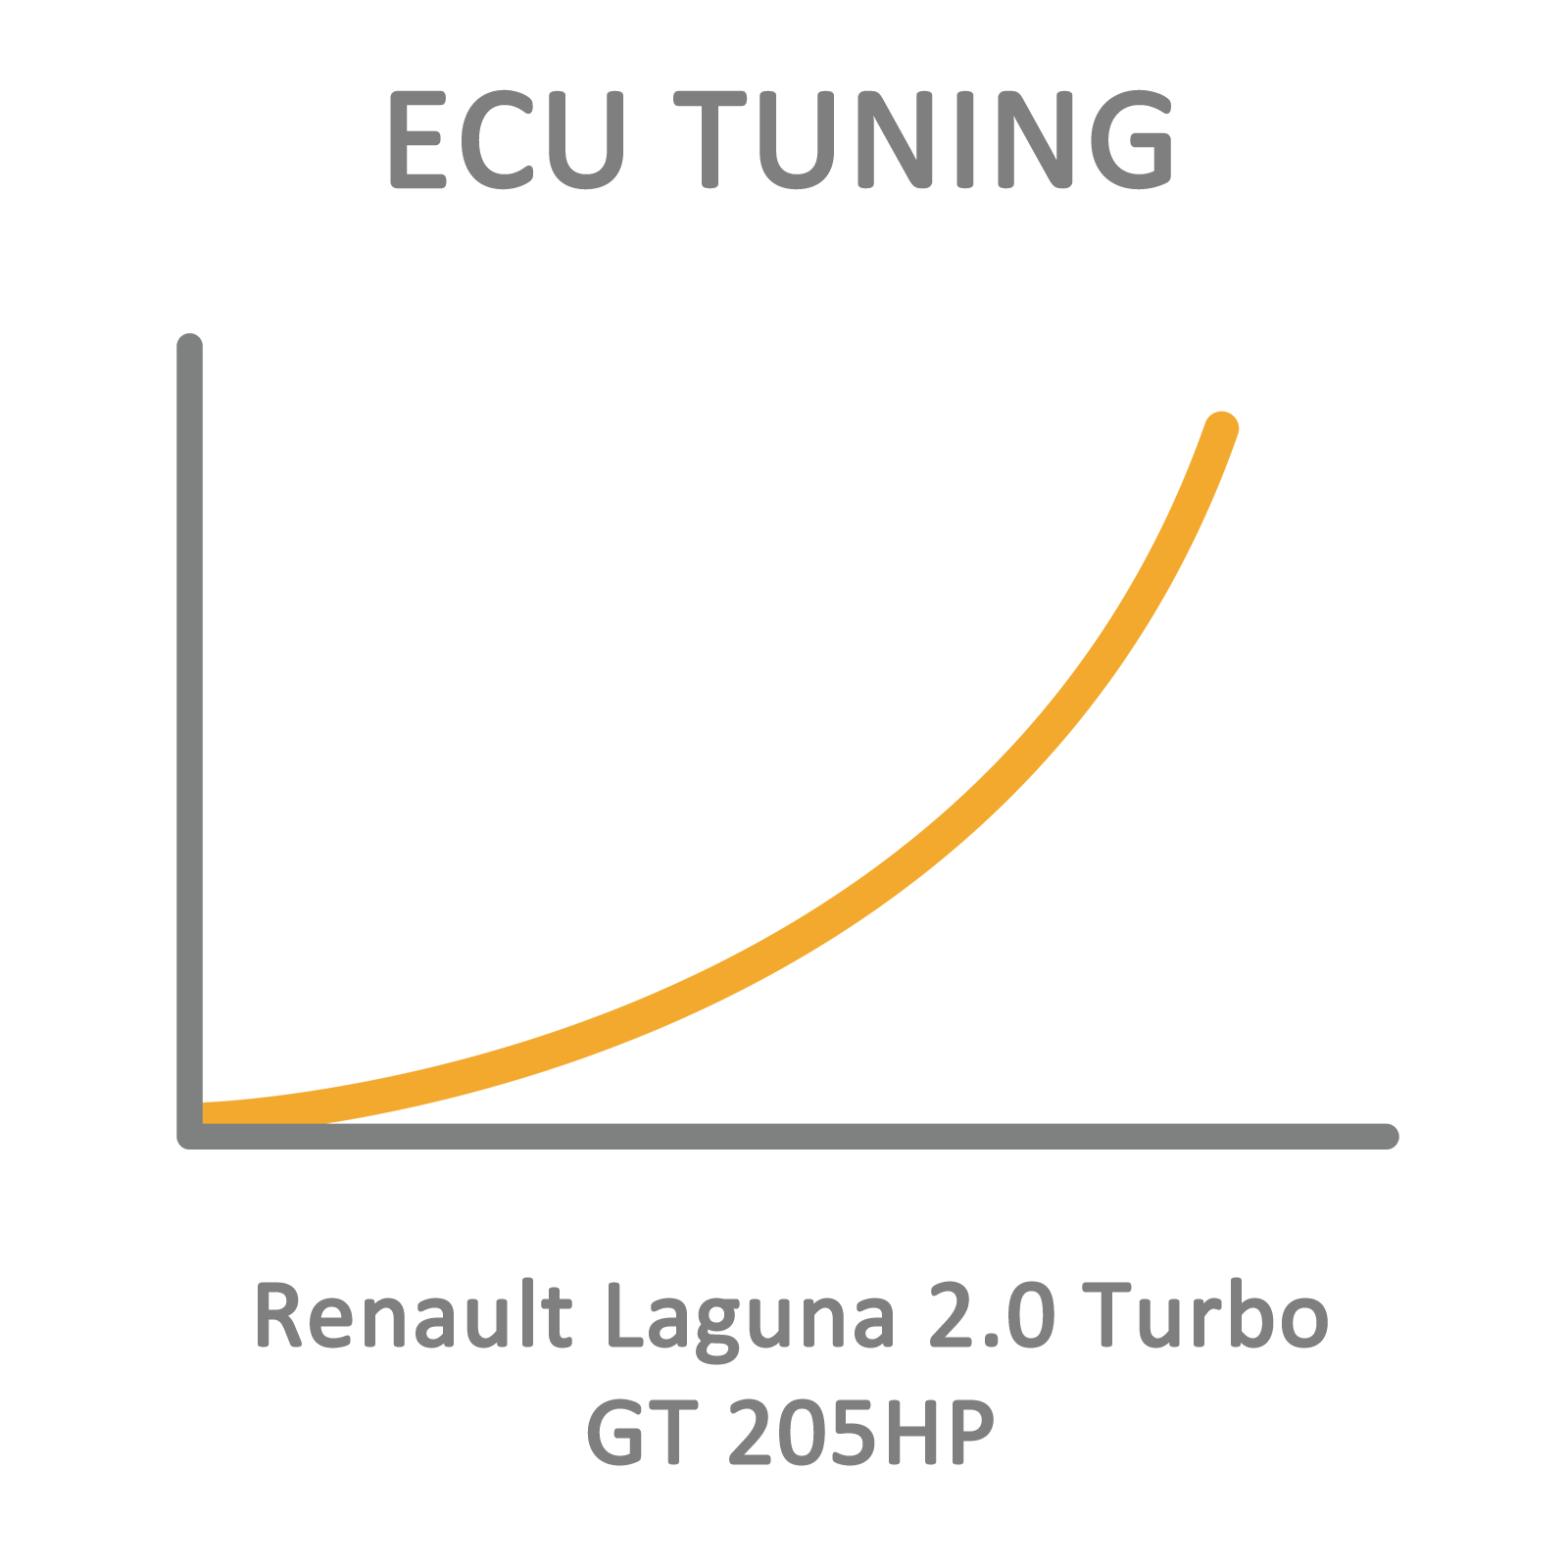 Renault Laguna 2.0 Turbo GT 205HP ECU Tuning Remapping